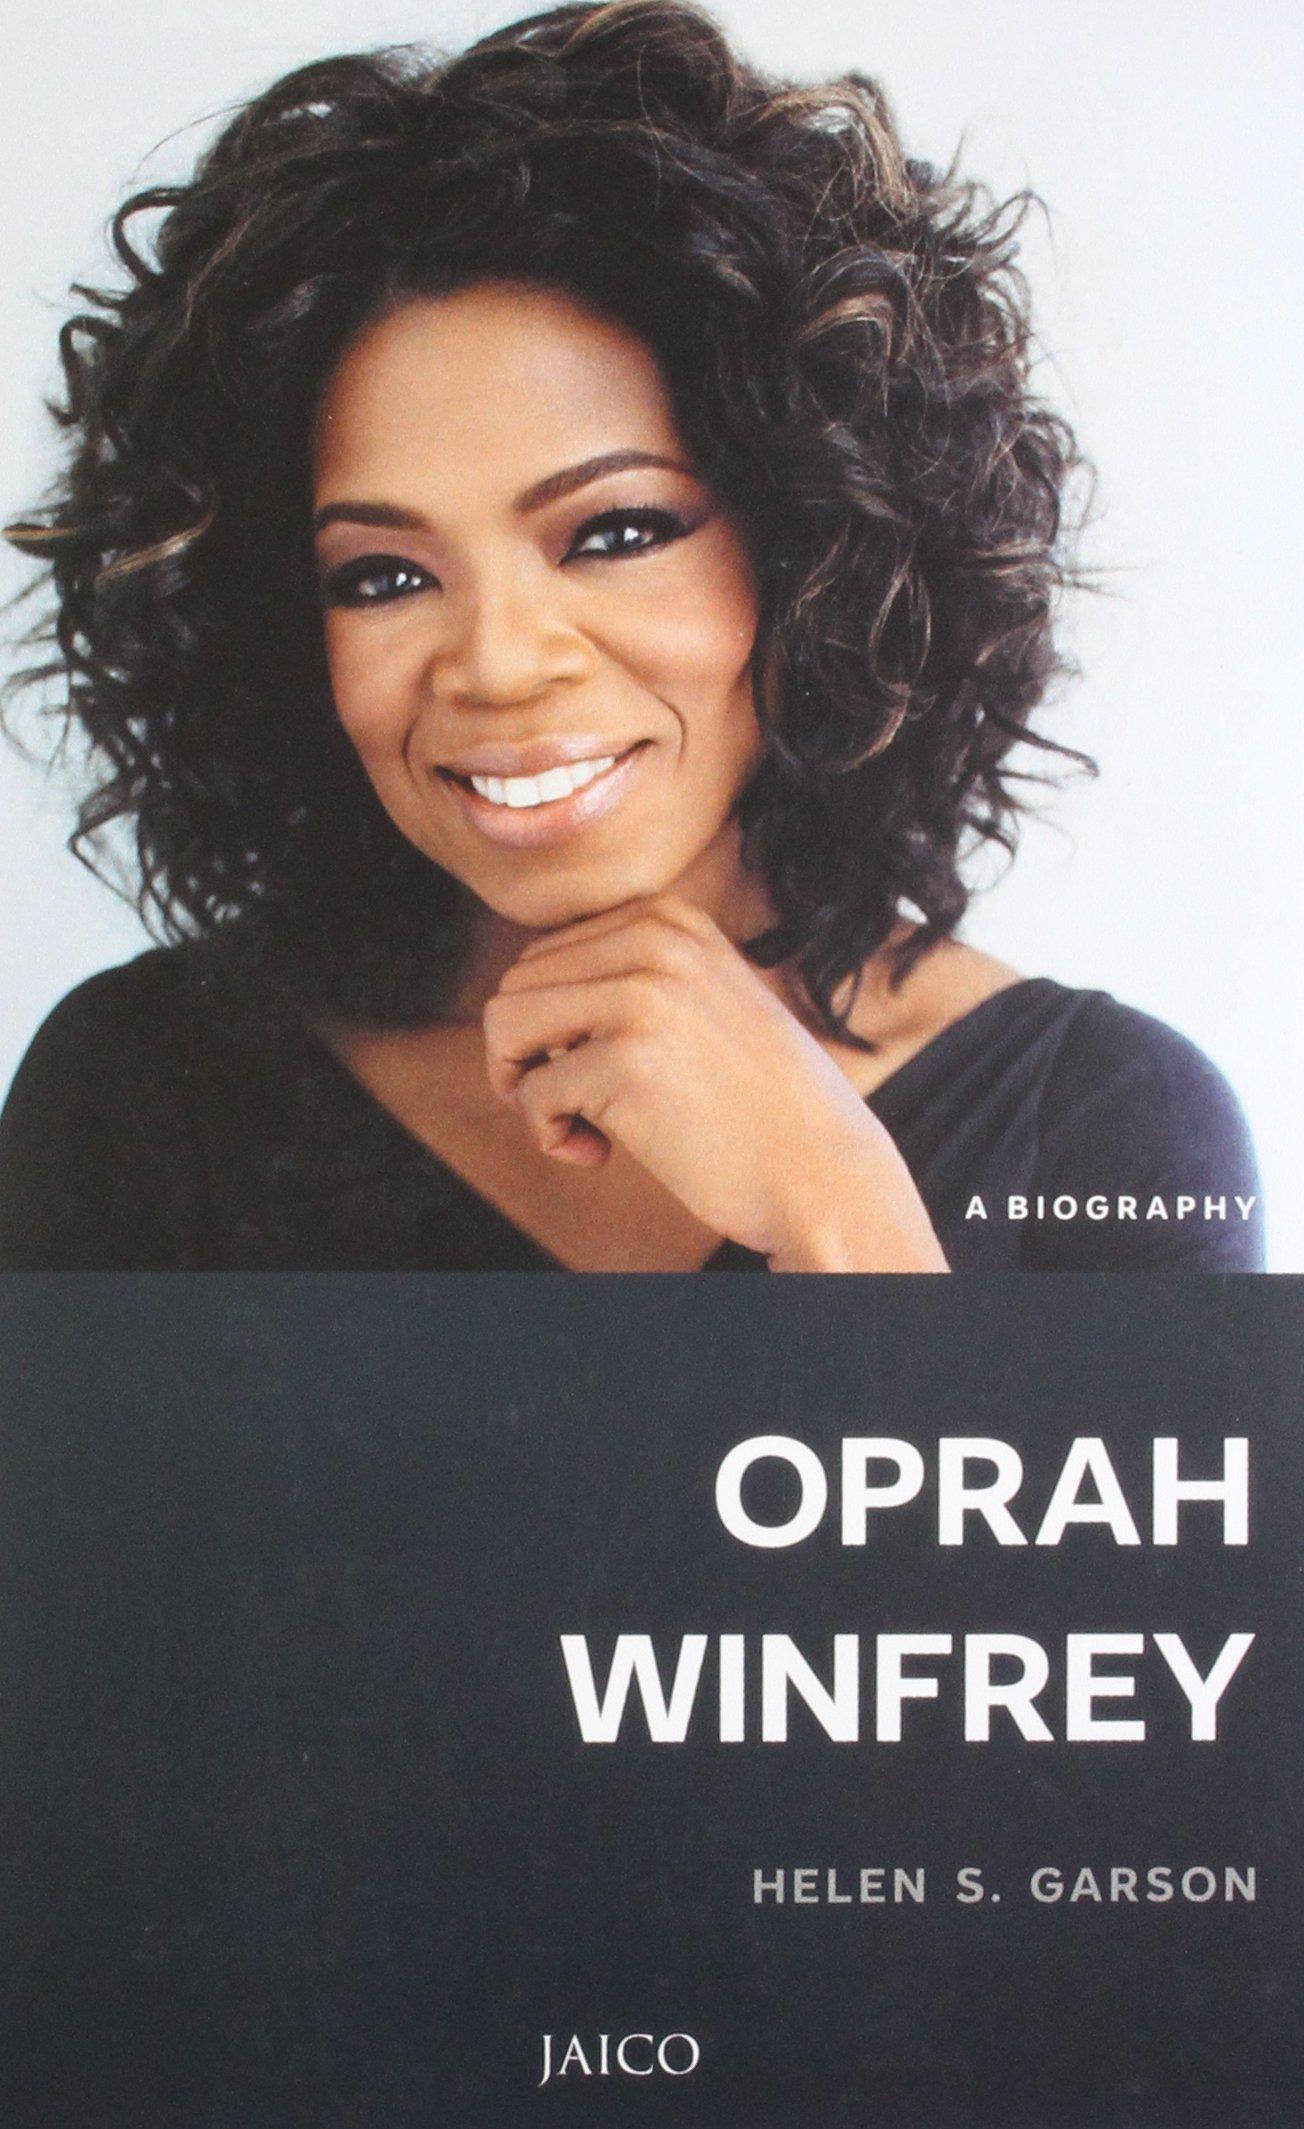 Oprah winfrey autobiography